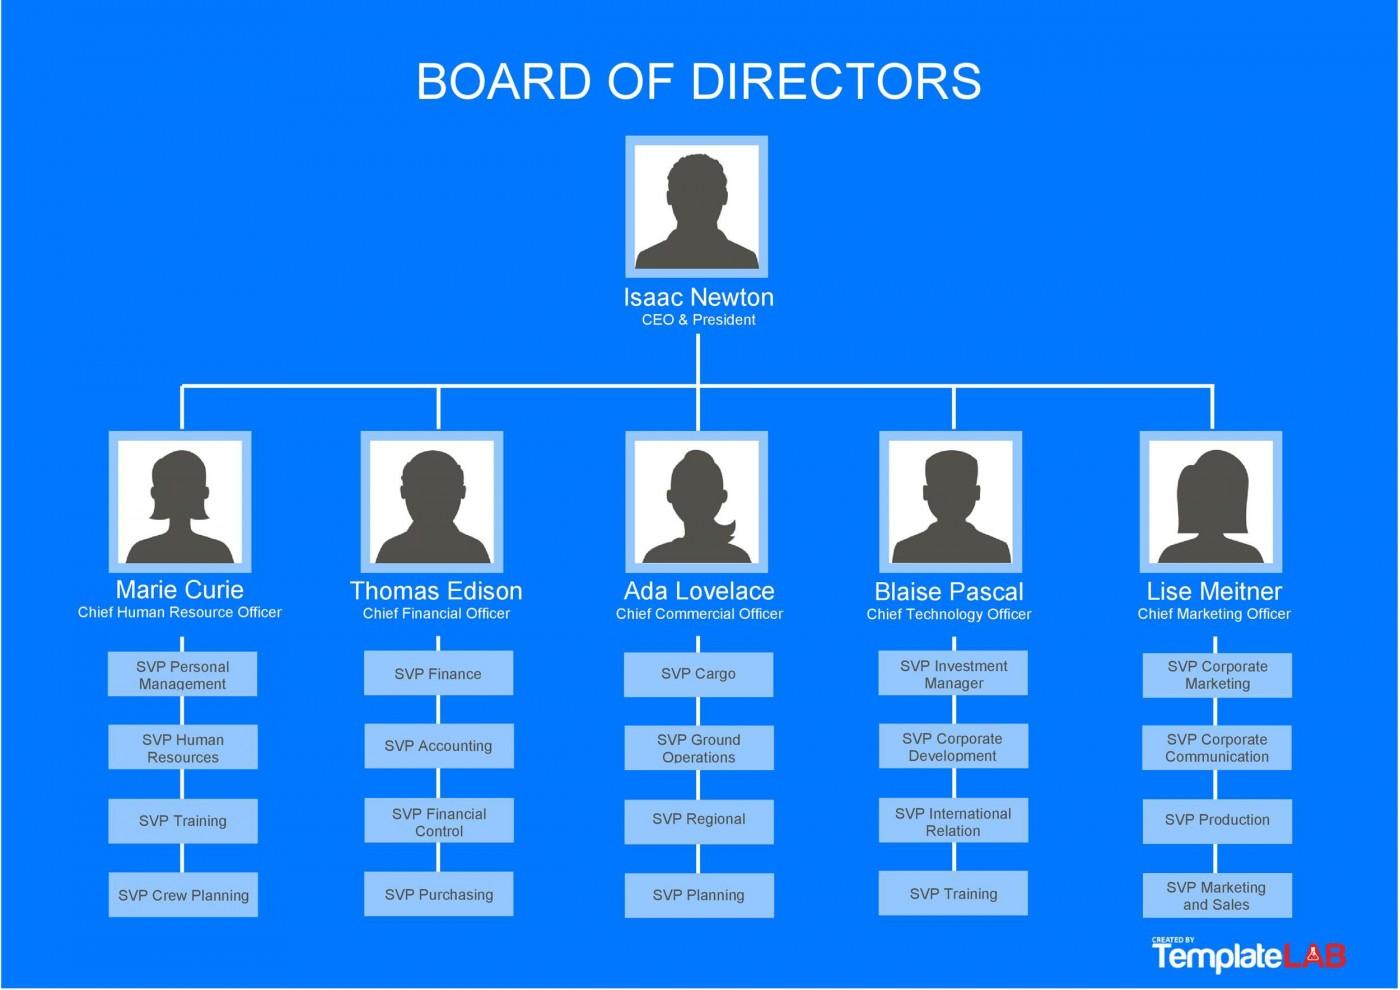 001 Stirring Organizational Chart Template Word Image  2013 2010 20071400